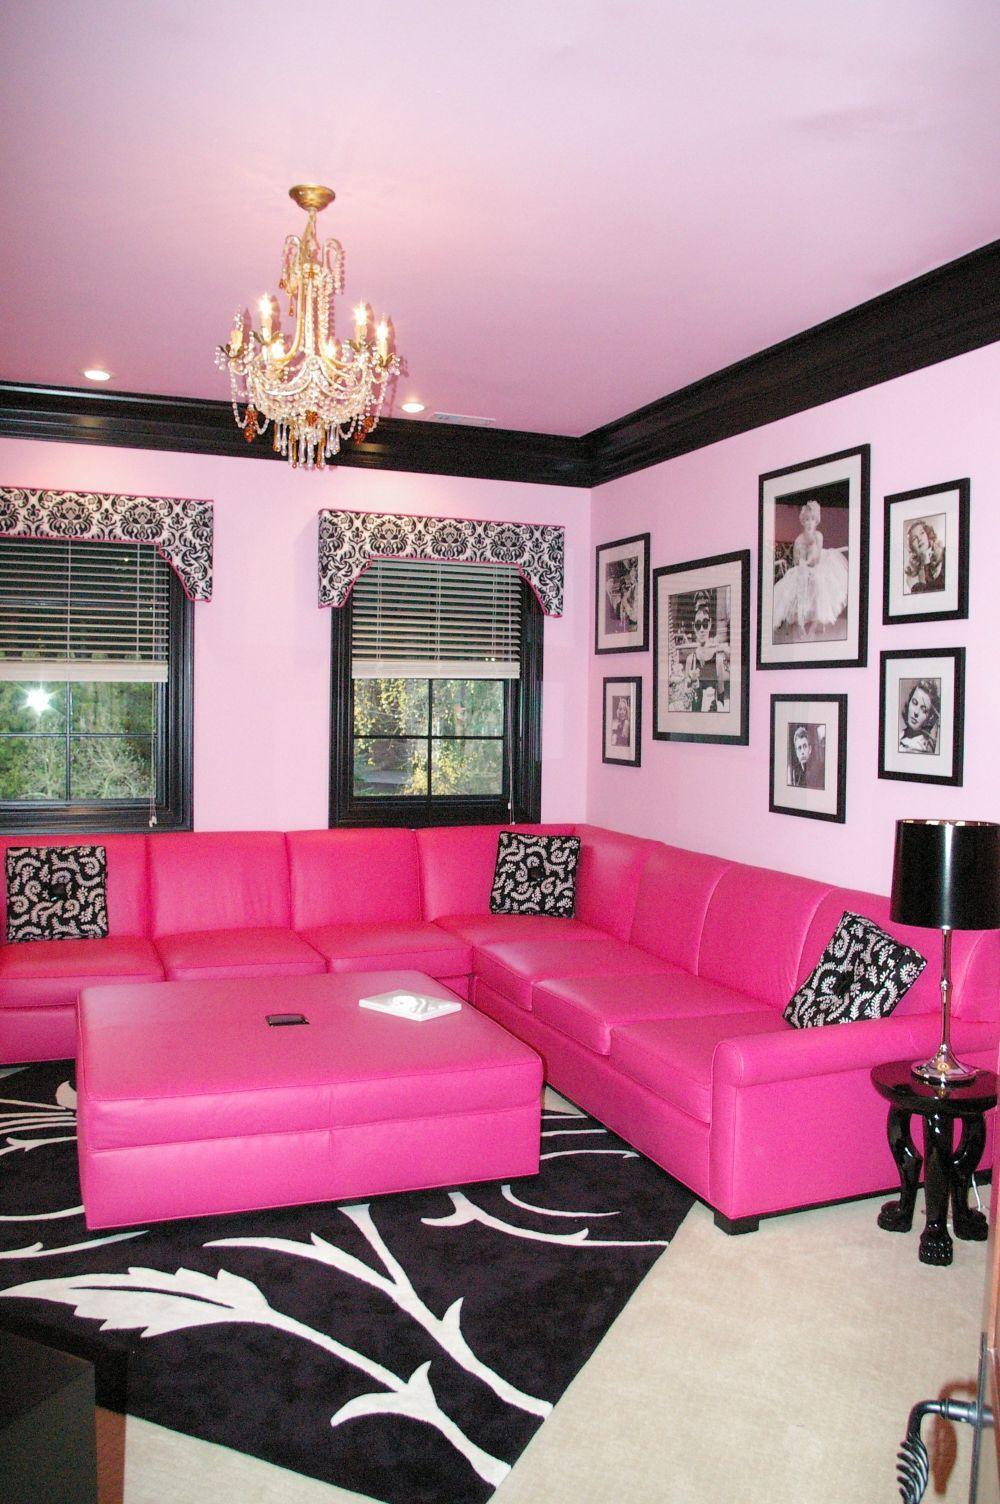 Oh my princess wanddekoration rosa wohnzimmer und for Wohnzimmer wanddekoration